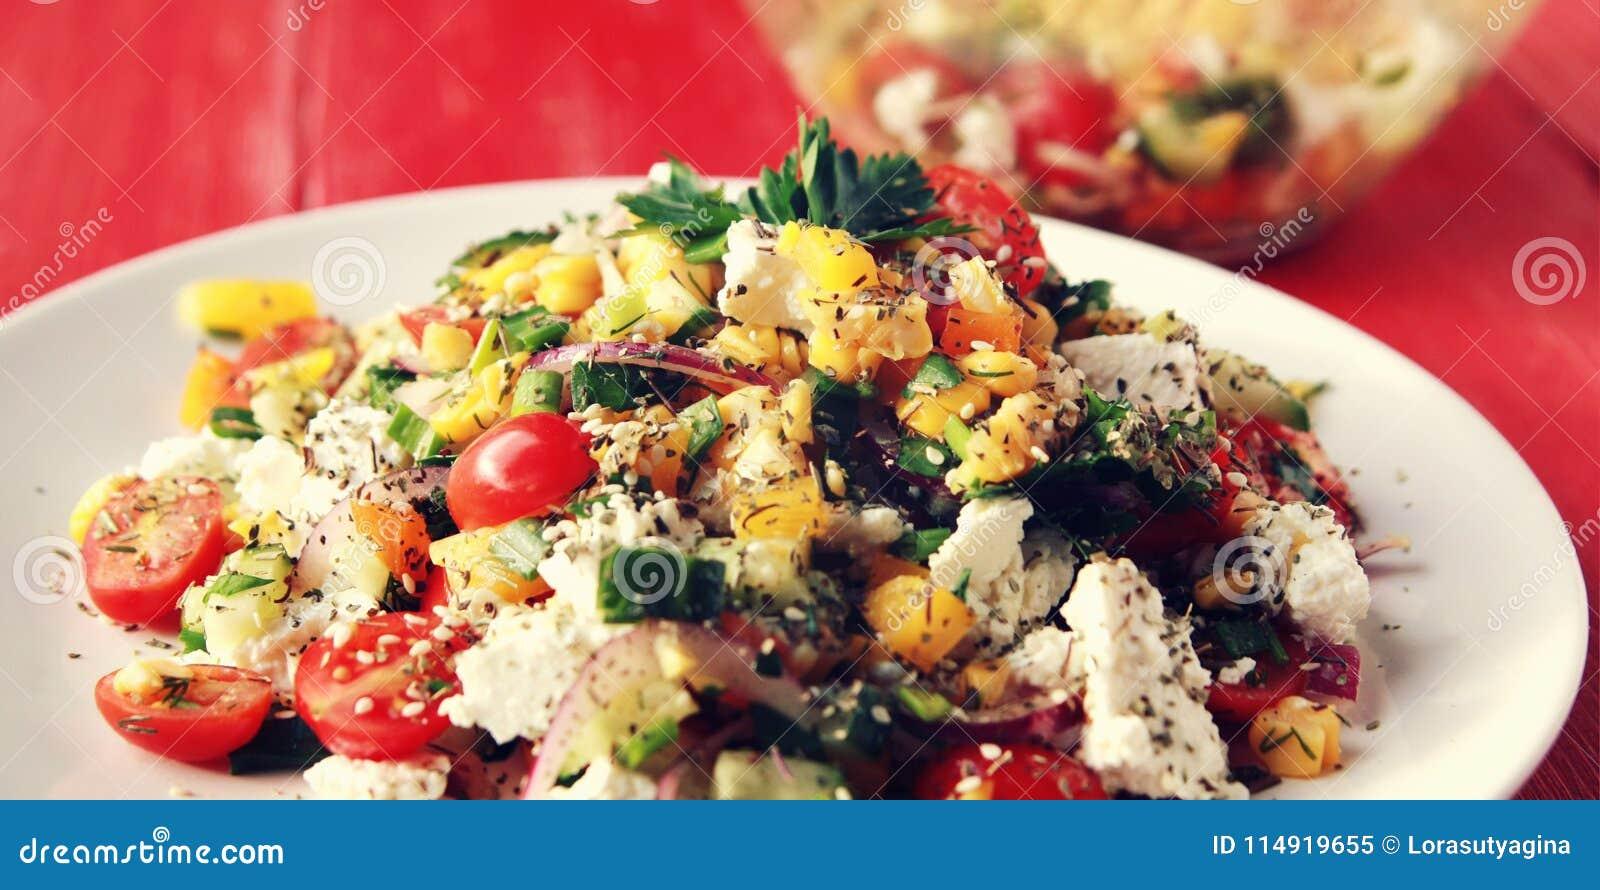 Sensational Colorful Vegetable Mix Simple Low Calories Salad Stock Interior Design Ideas Clesiryabchikinfo